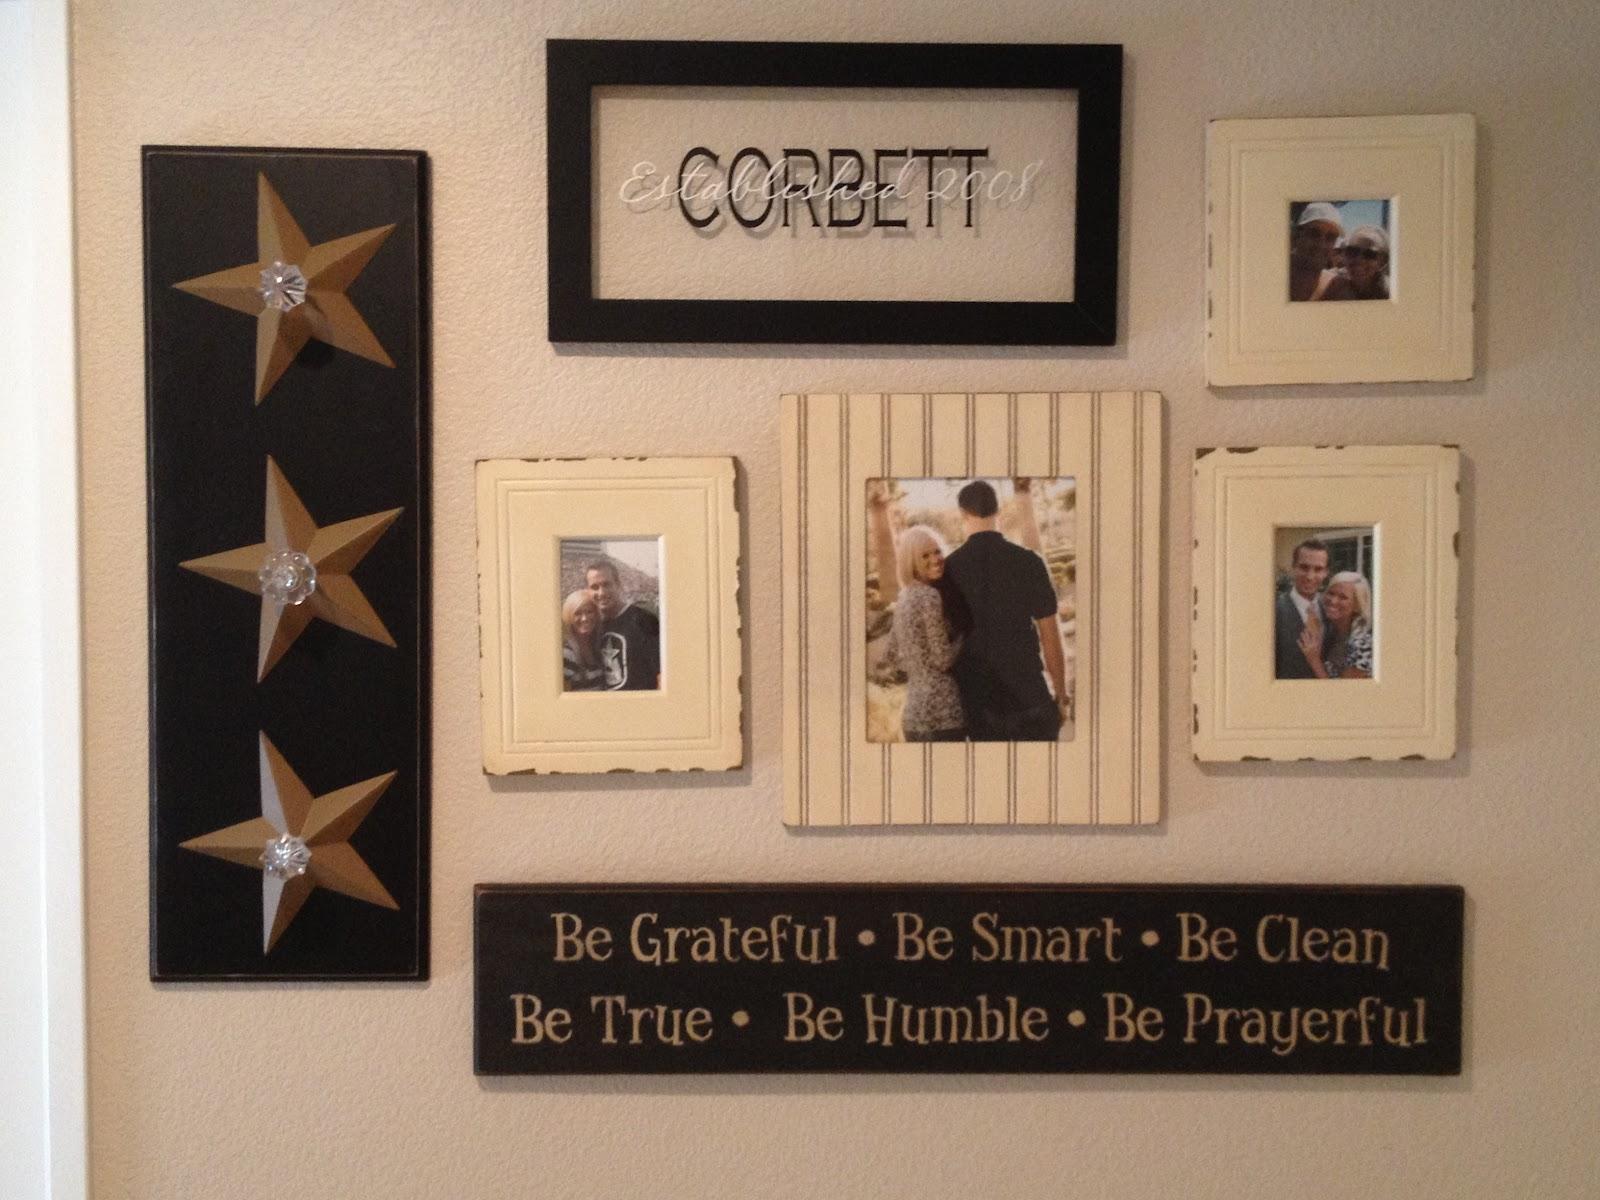 Arranging photos on a wall - Wall Arranging